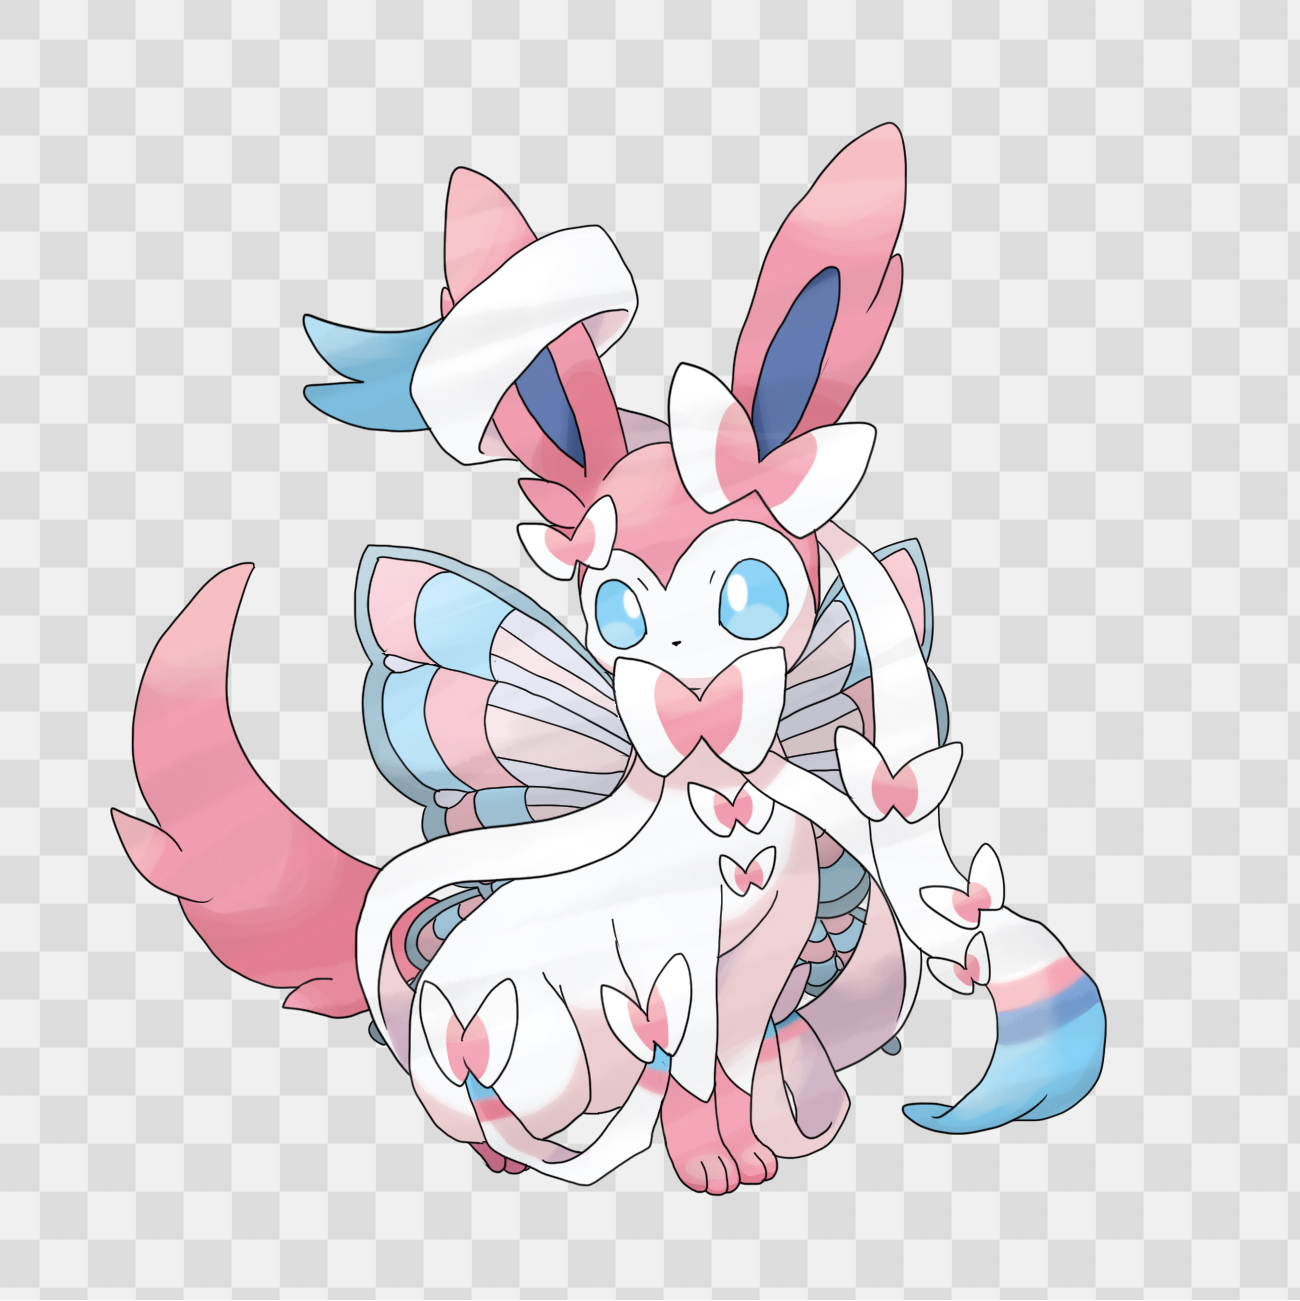 Sylveon - Pokémon - Image #1610566 - Zerochan Anime Image ...